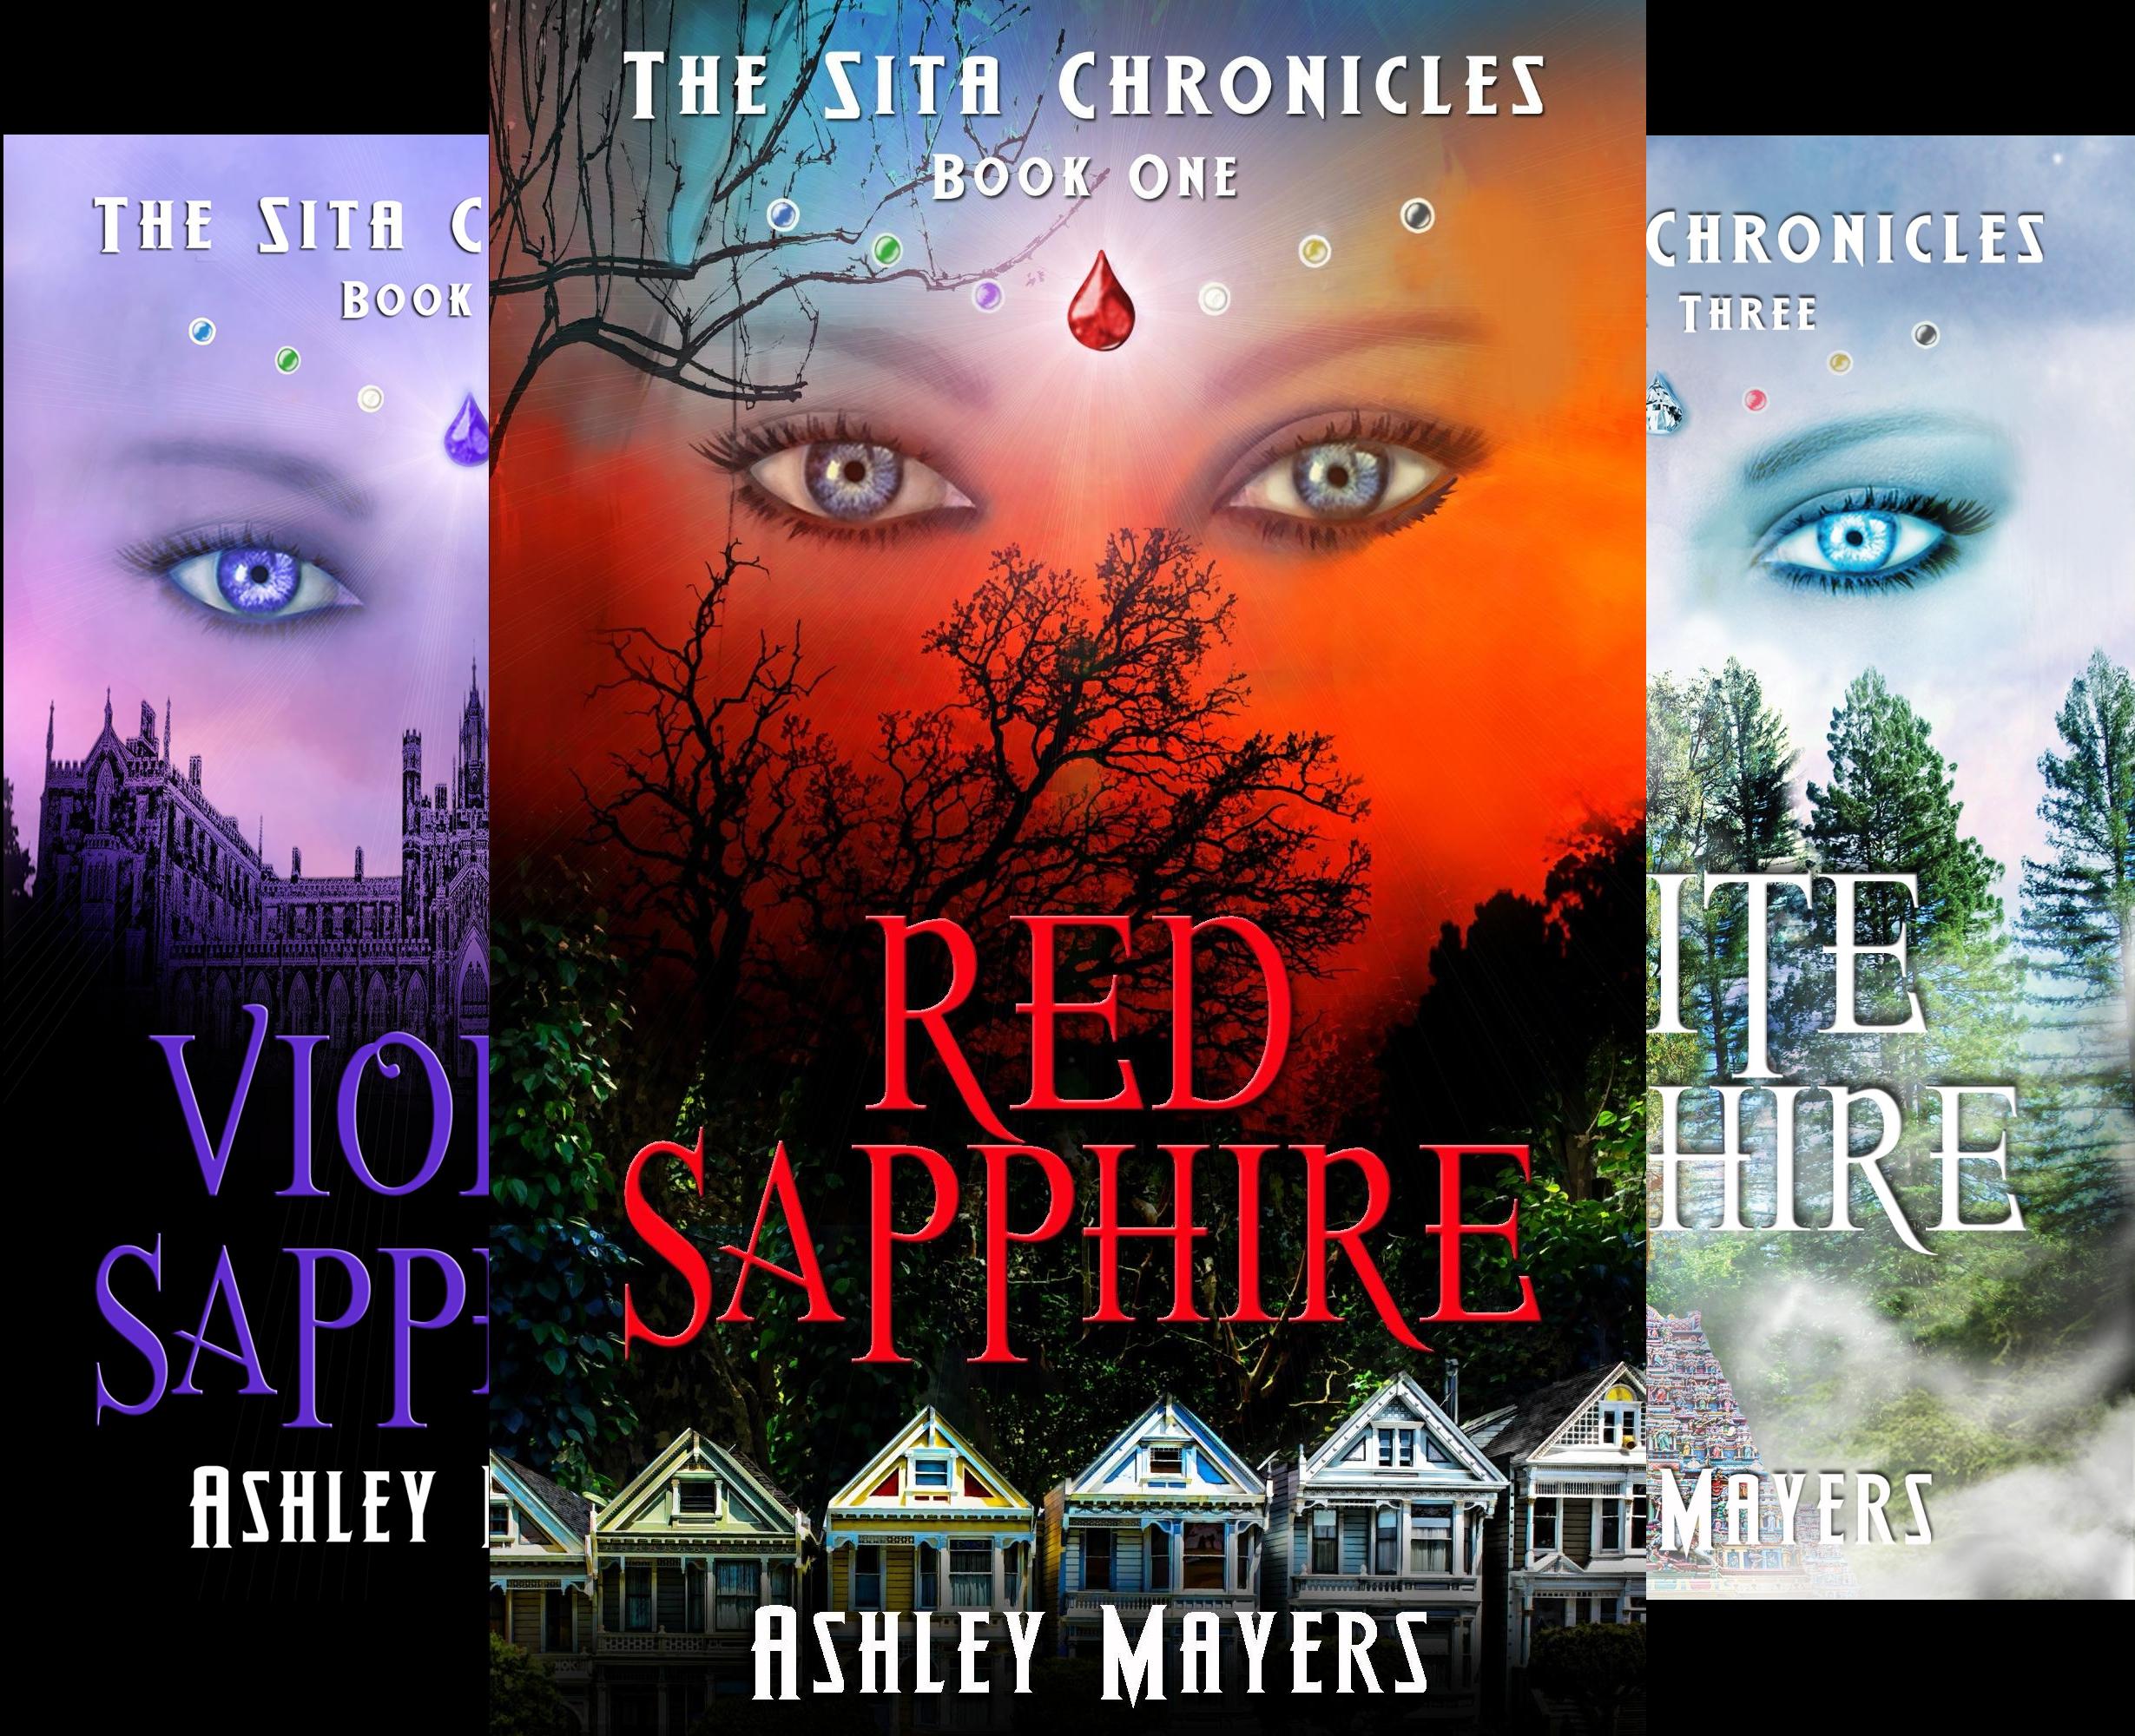 The Sita Chronicles (7 Book Series)